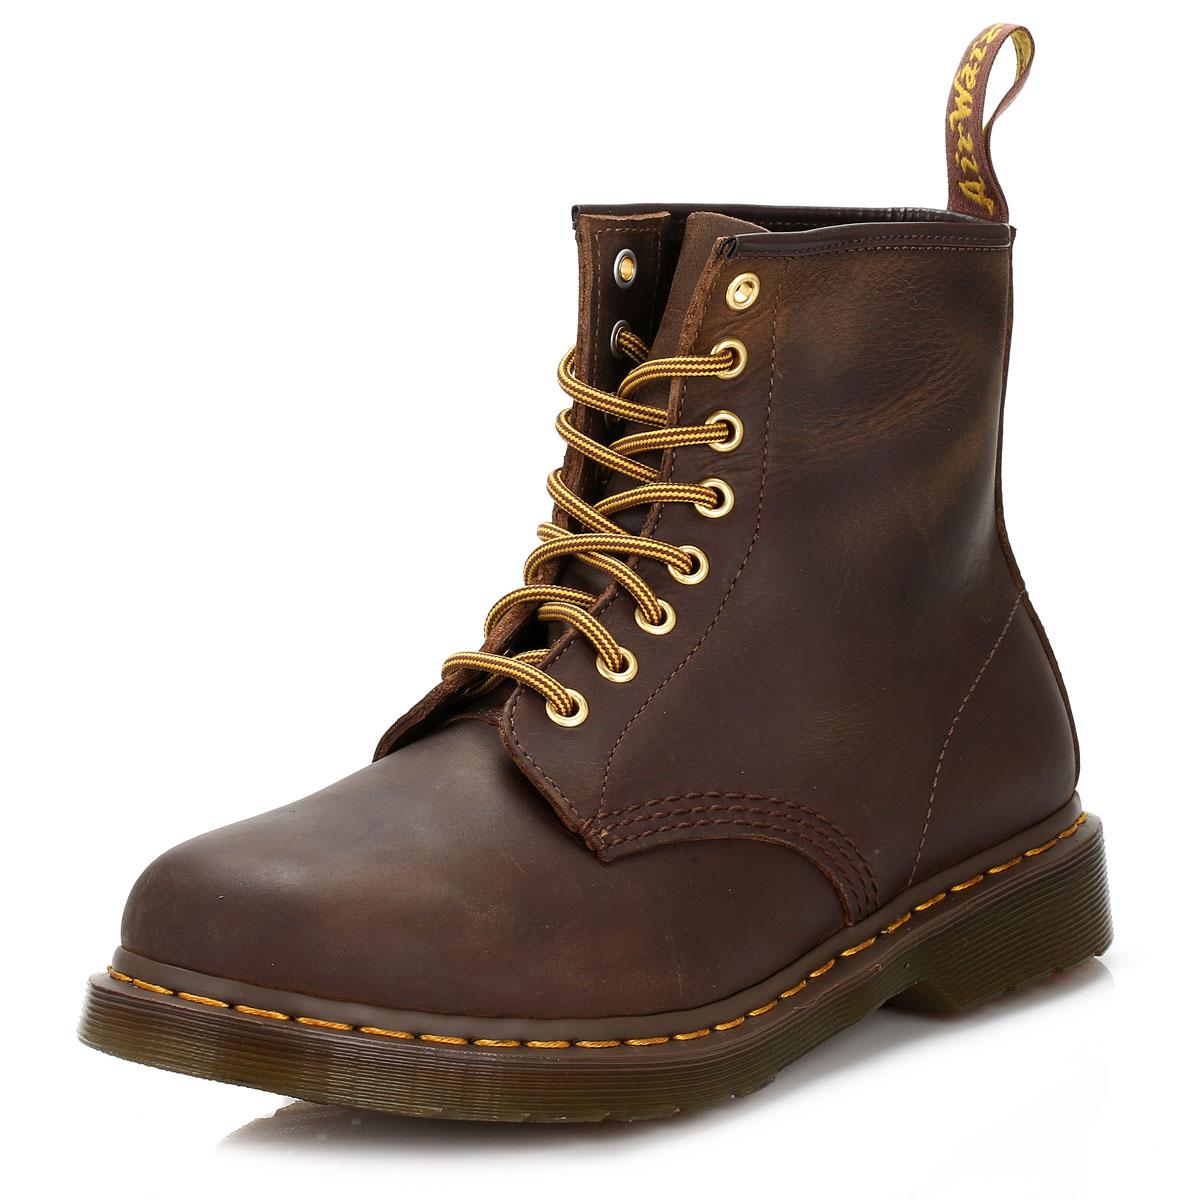 dc0617da1f0b1 Details about Dr. Martens 1460 Crazy Horse Aztec Brown Leather Ankle Boots  Unisex Winter Shoes